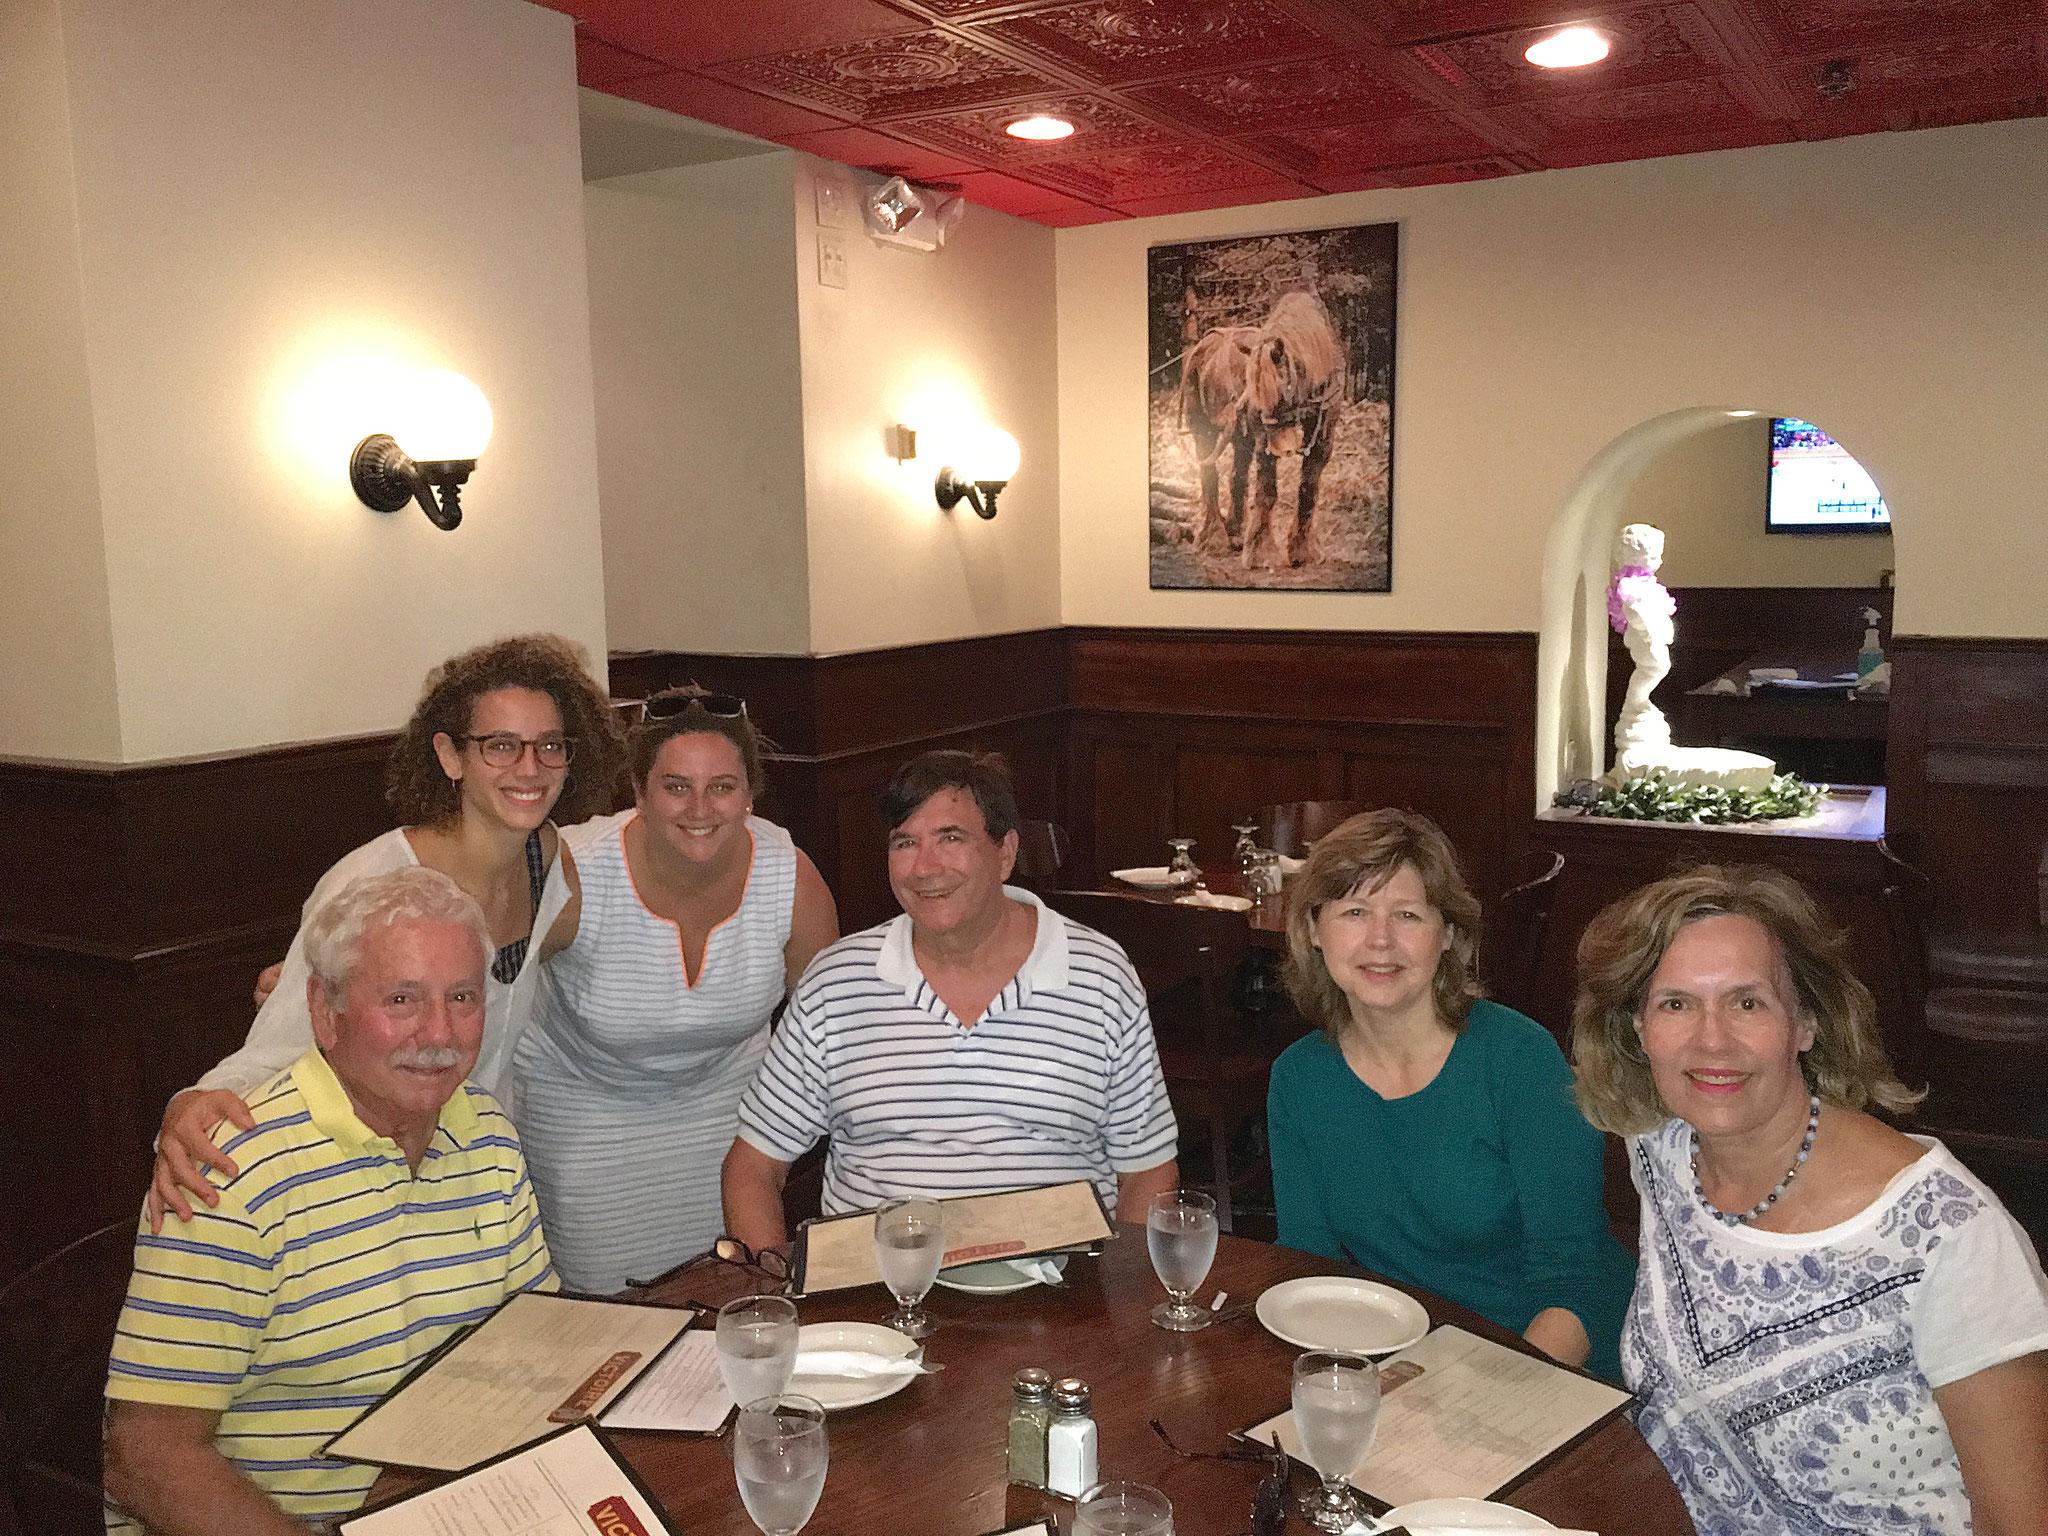 Don, Clara, Jean Fischman, John W., Barbara Lohse, & Lorraine in Rochester, NY 8-13-16